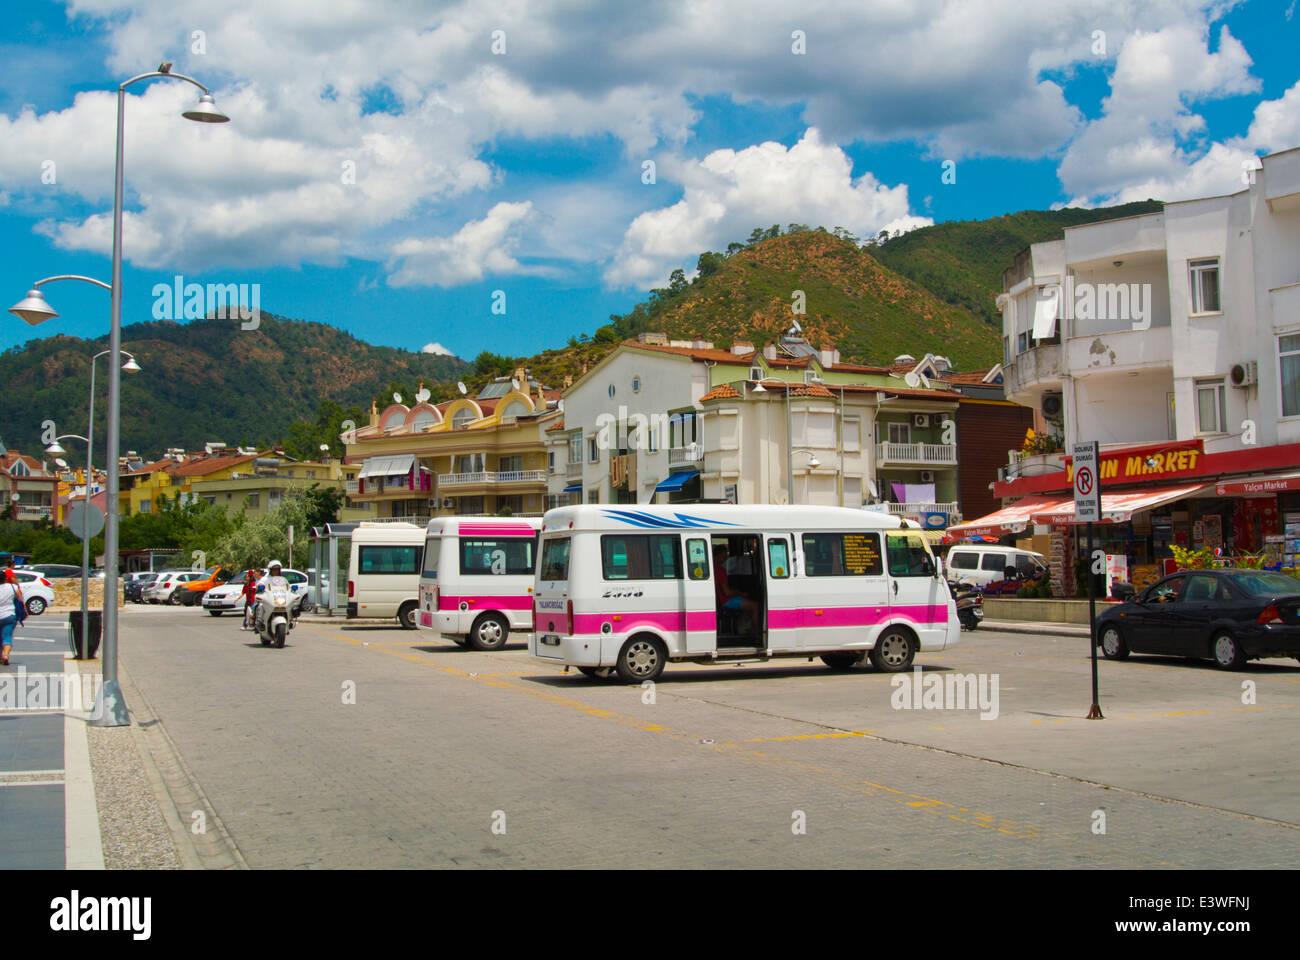 Dolmus minibus station next to Tansas supermarket near main square, Marmaris, Mugla province, Turkey, Asia Minor - Stock Image